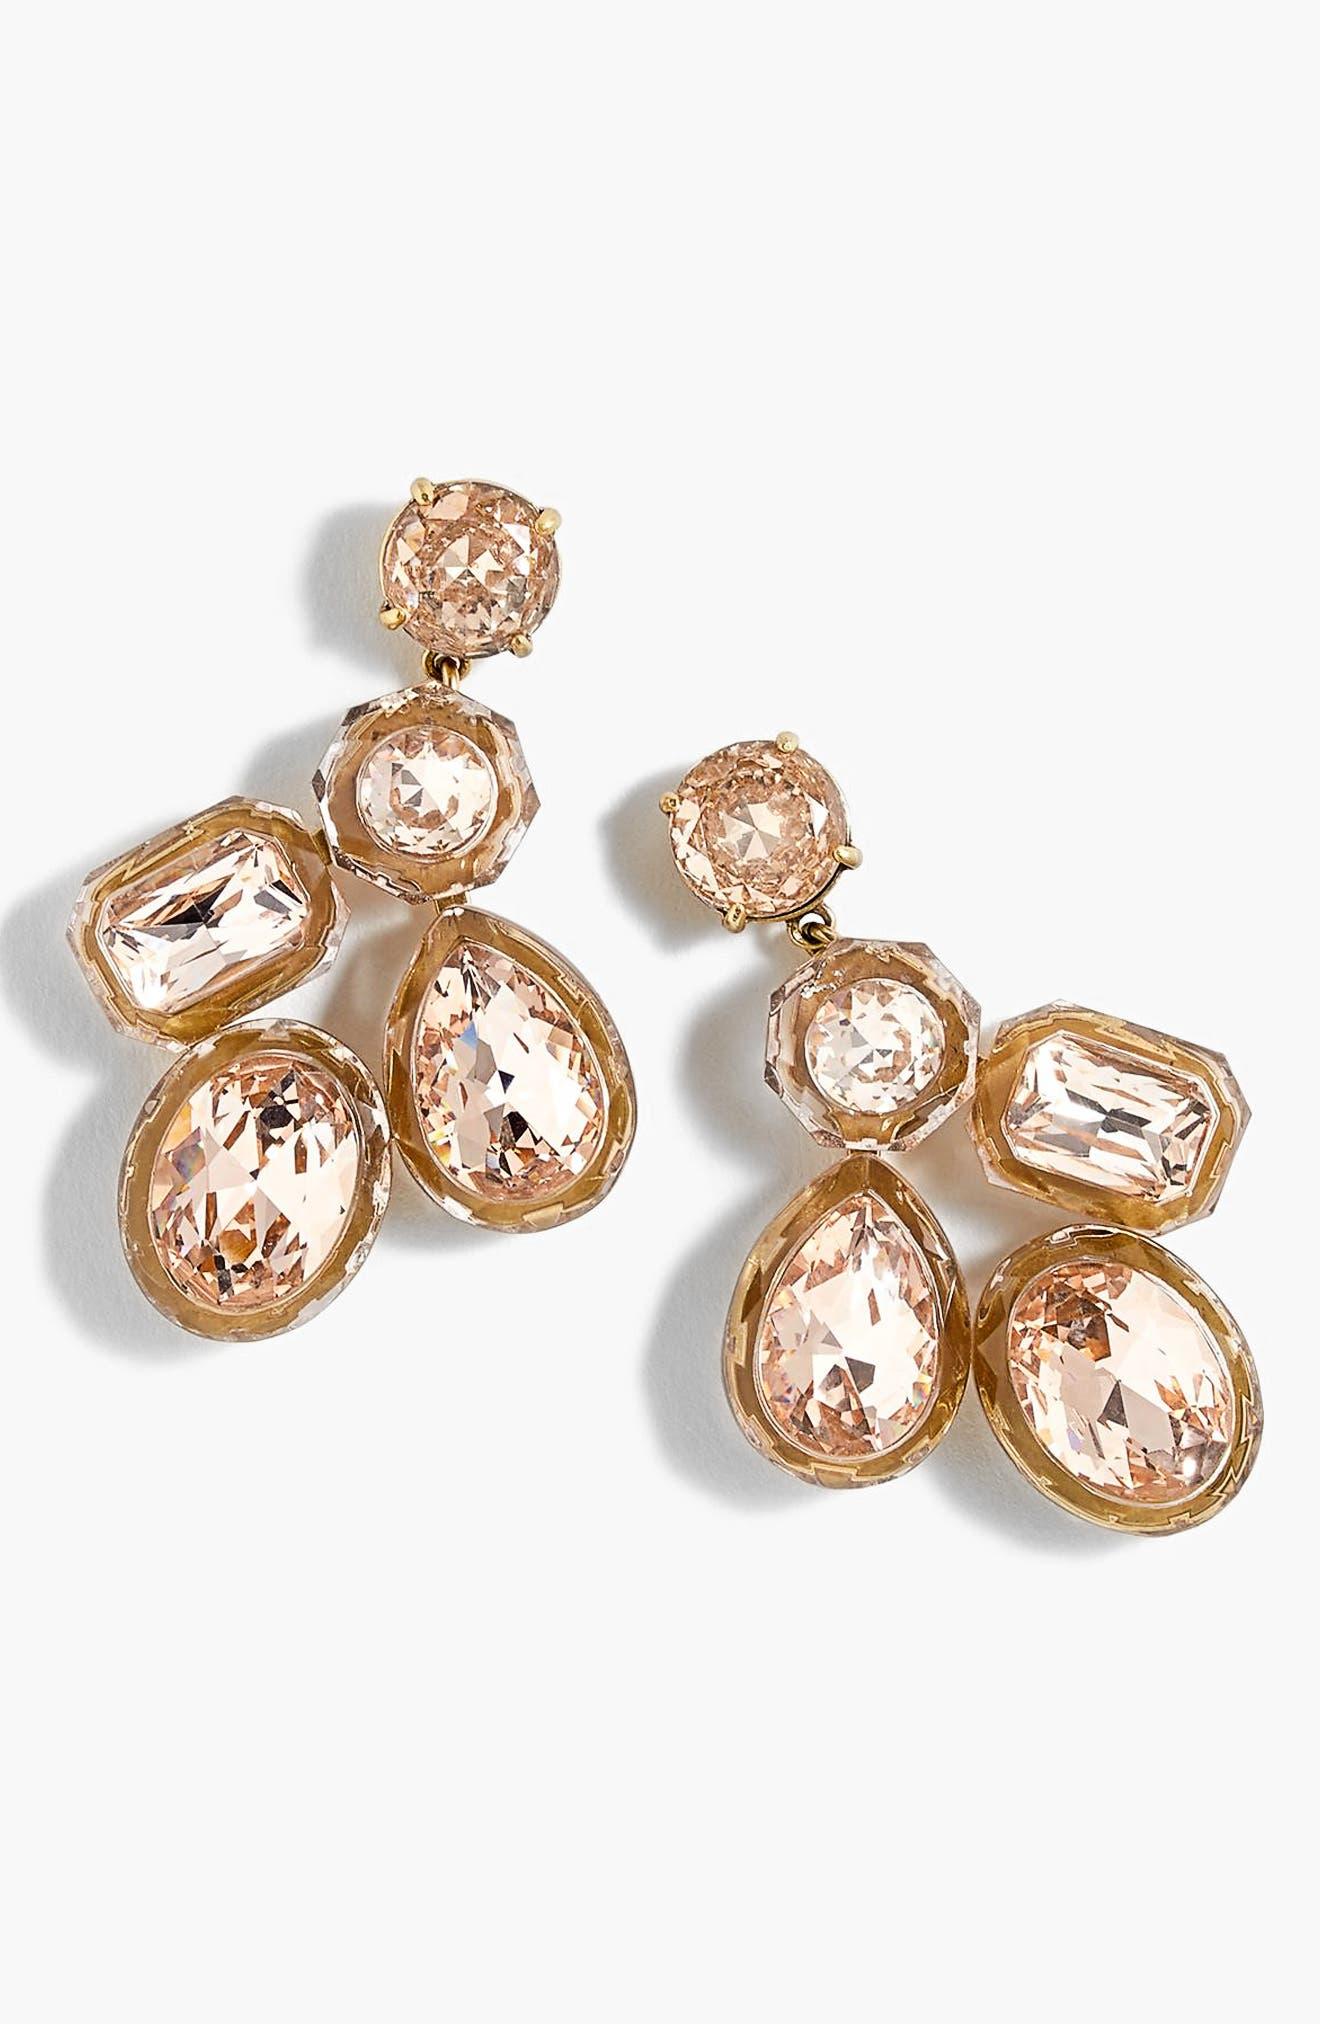 Main Image - J.Crew Jewel Box Cluster Earrings